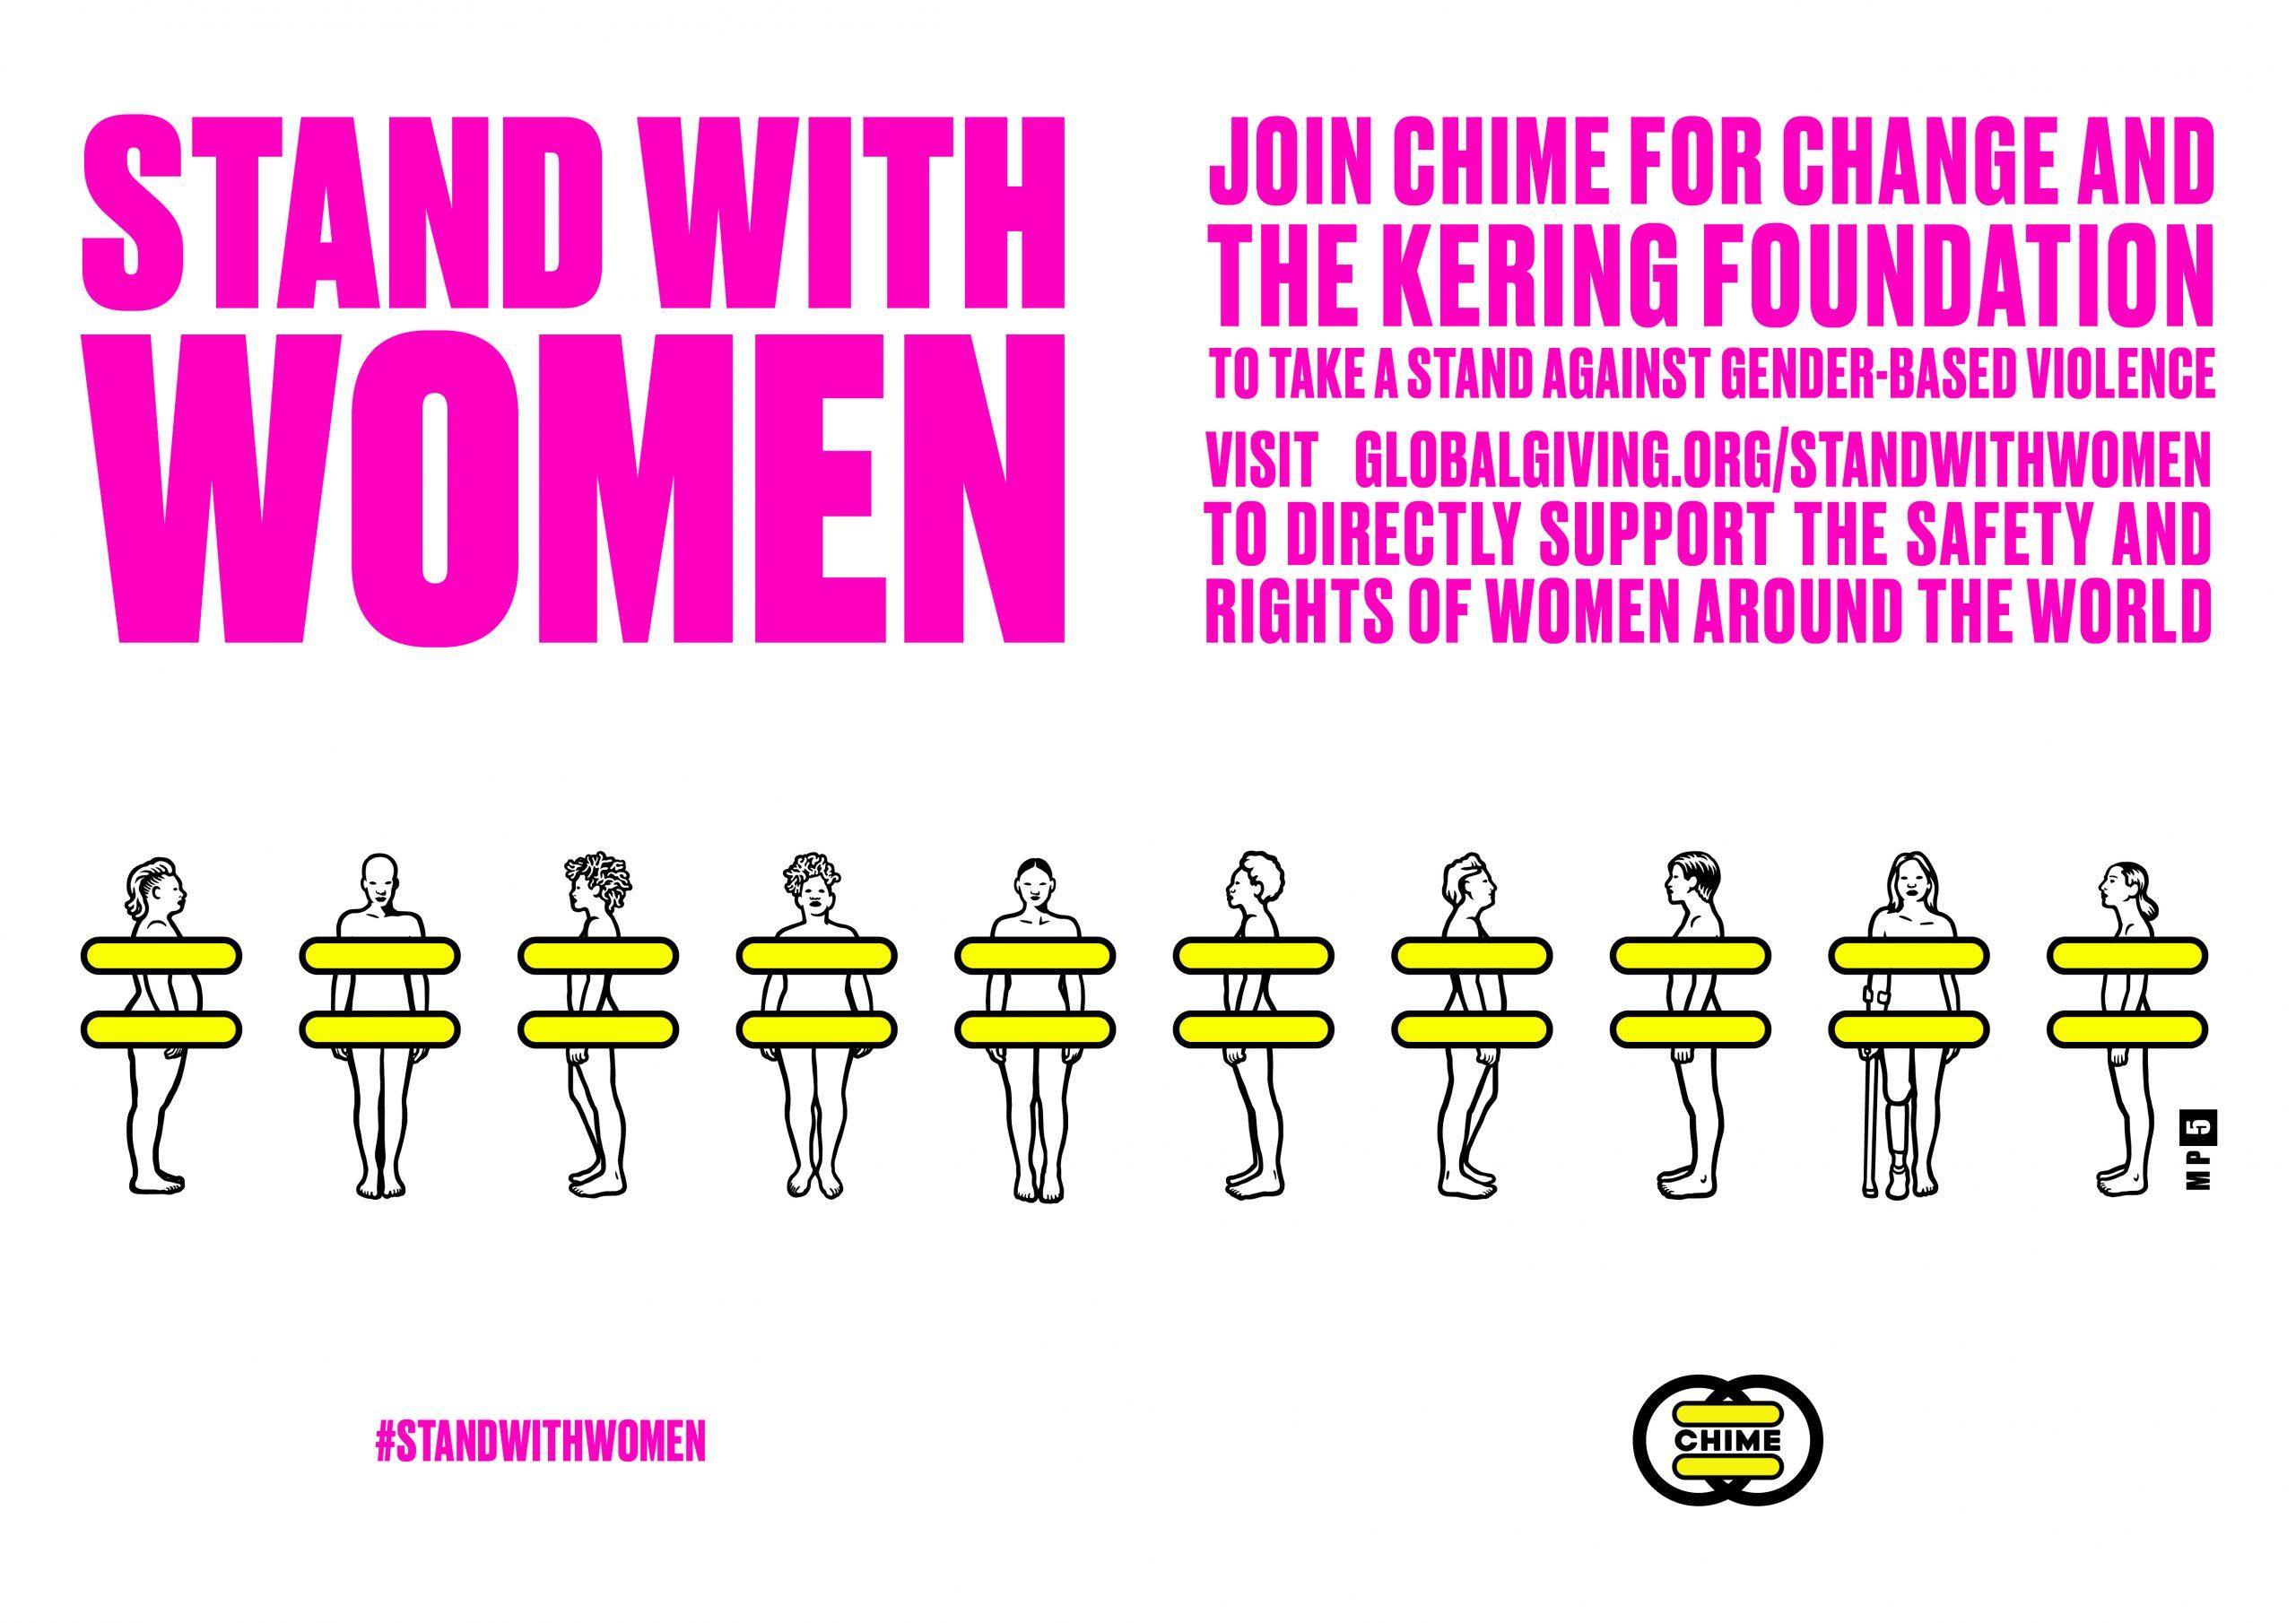 #StandWithWomen